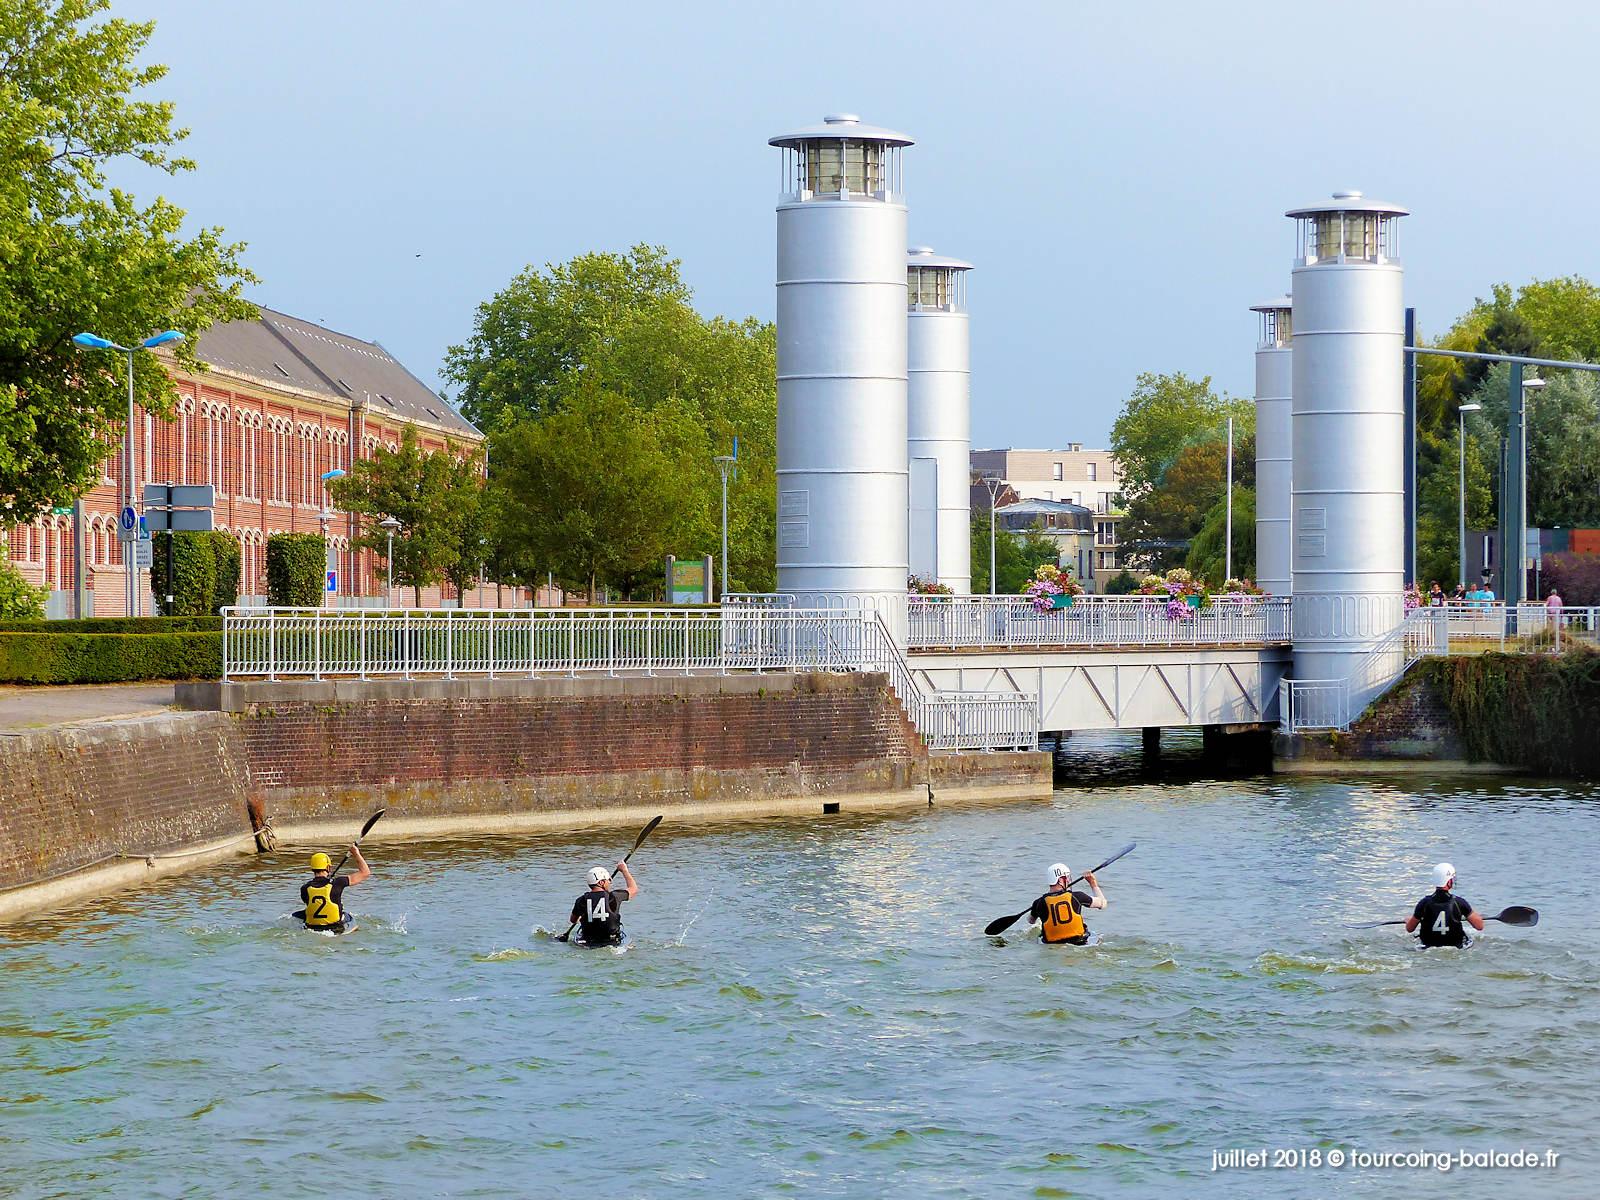 Entraînement Kayak-Polo, Canal de Tourcoing 2018